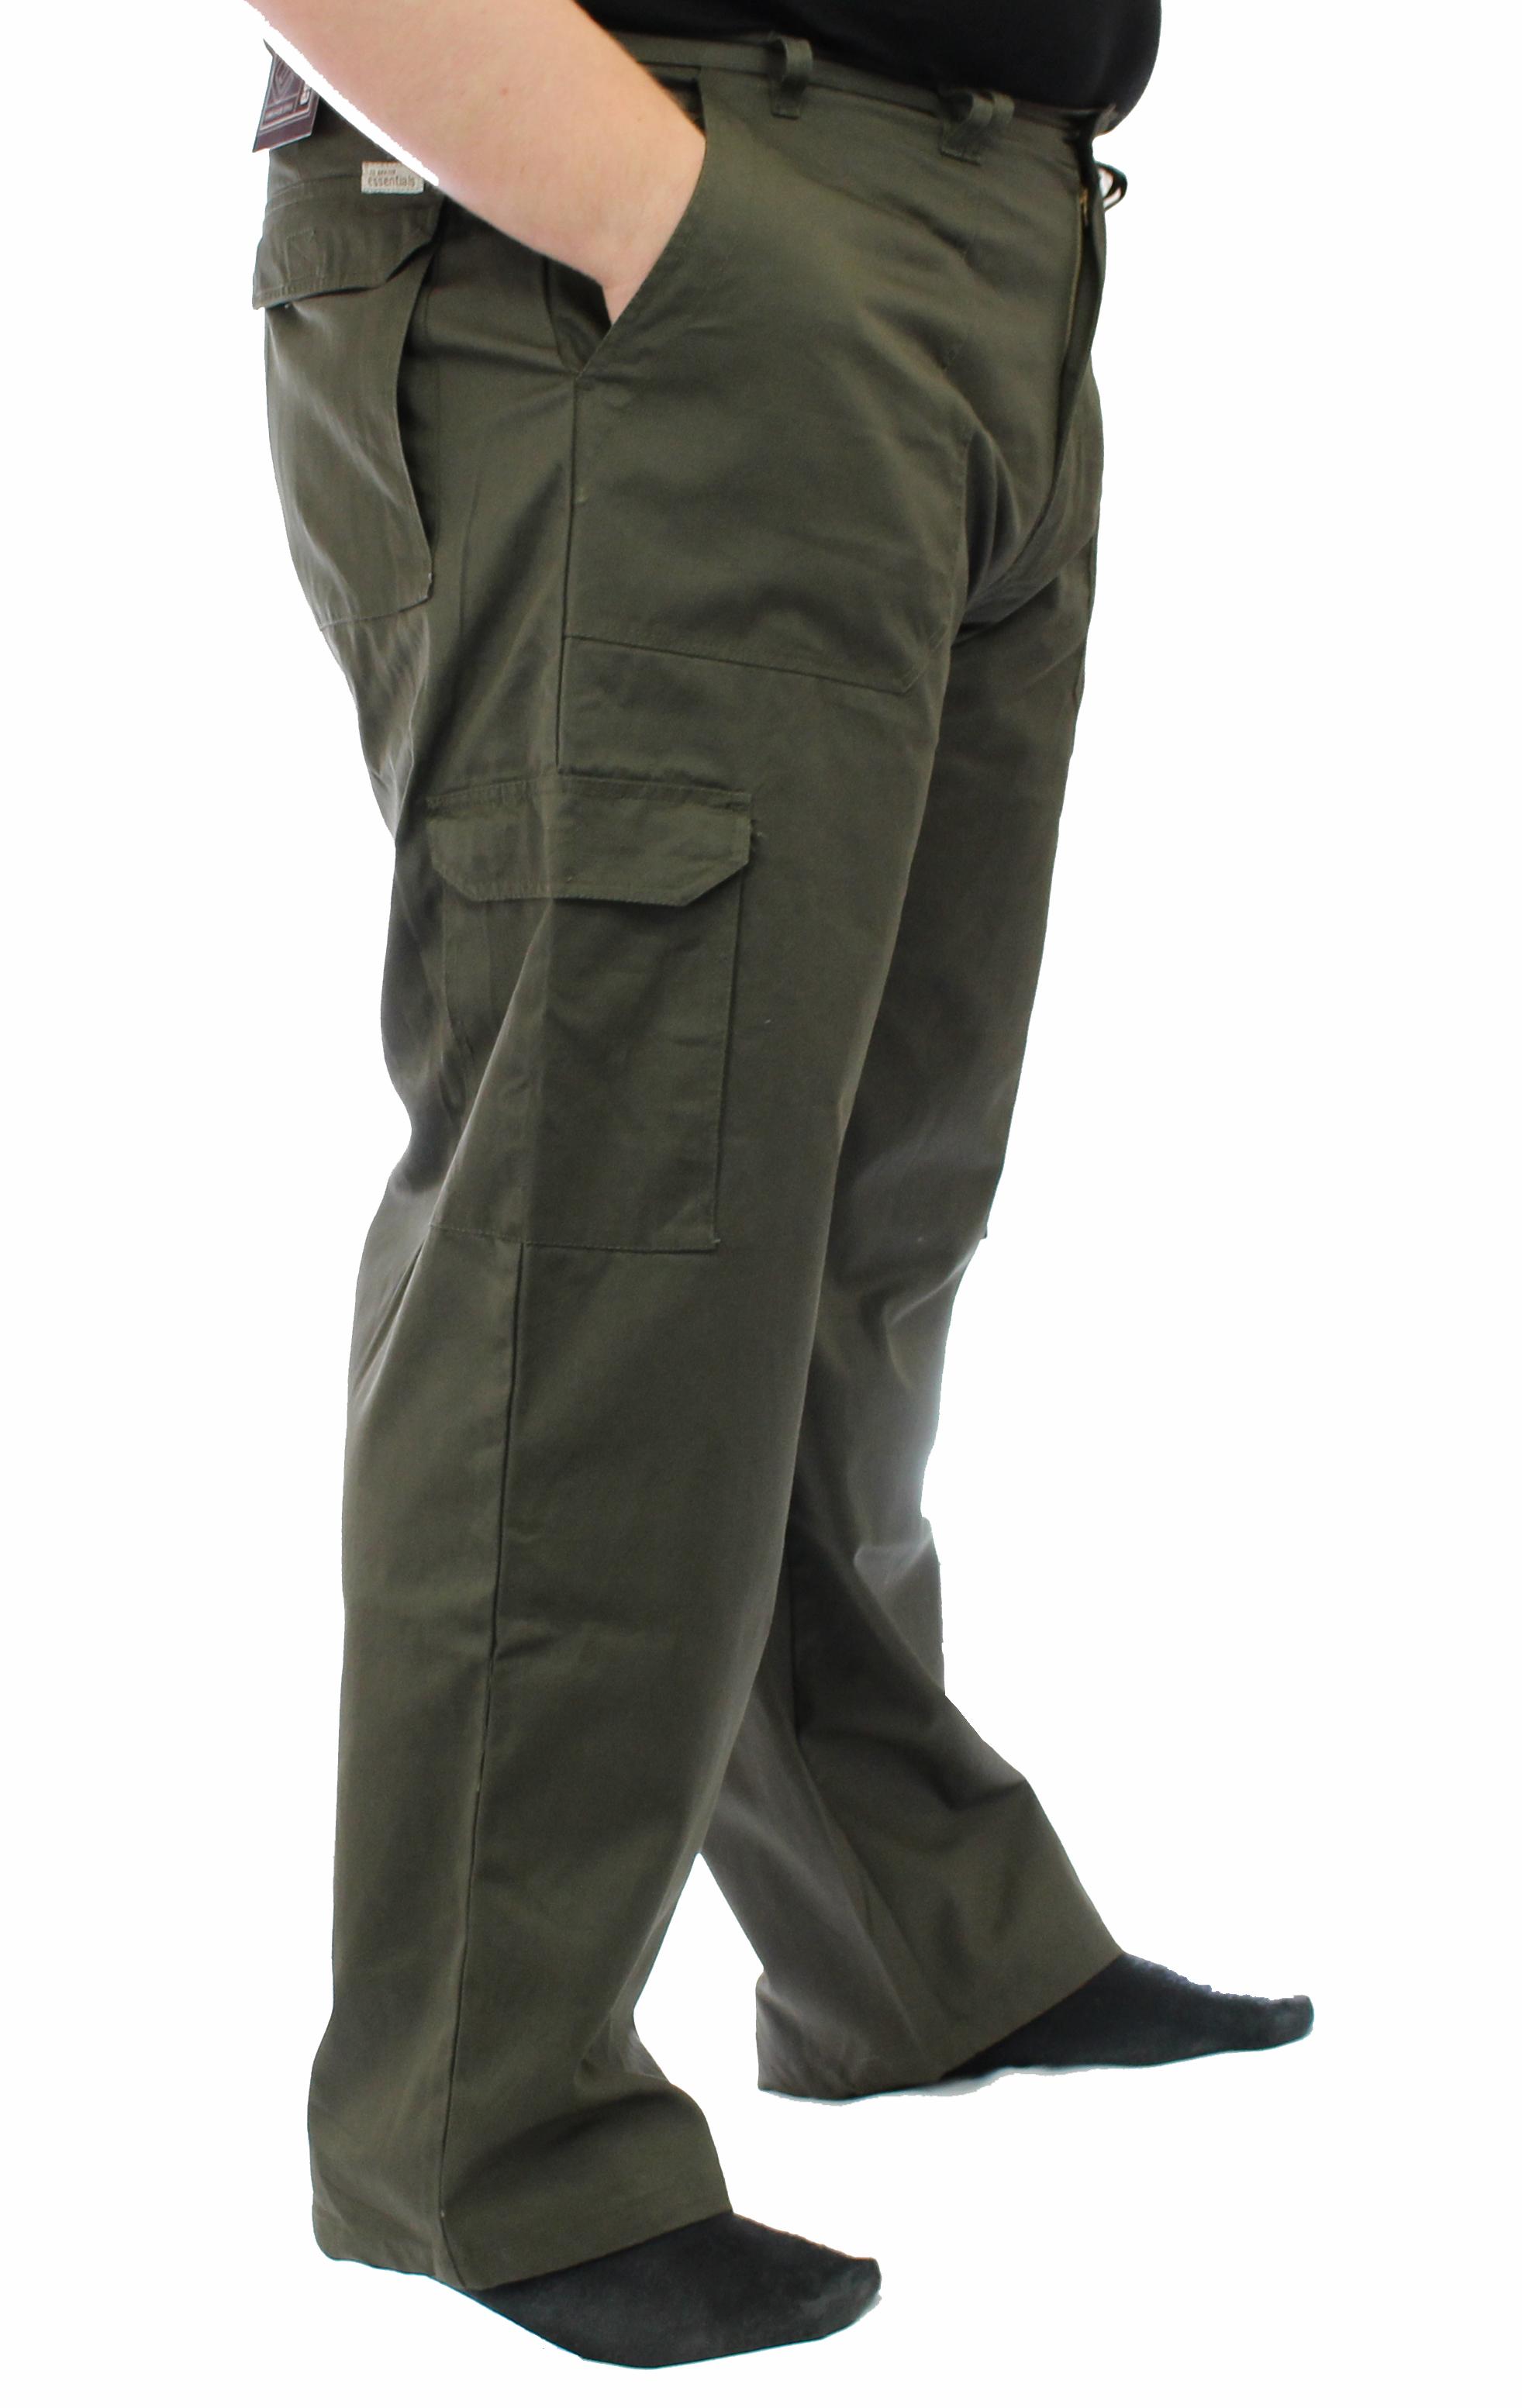 "Ed Baxter Victory - Heavy Duty Cargo Combat Trousers - Khaki - 52"" Waist, 32"" Leg"